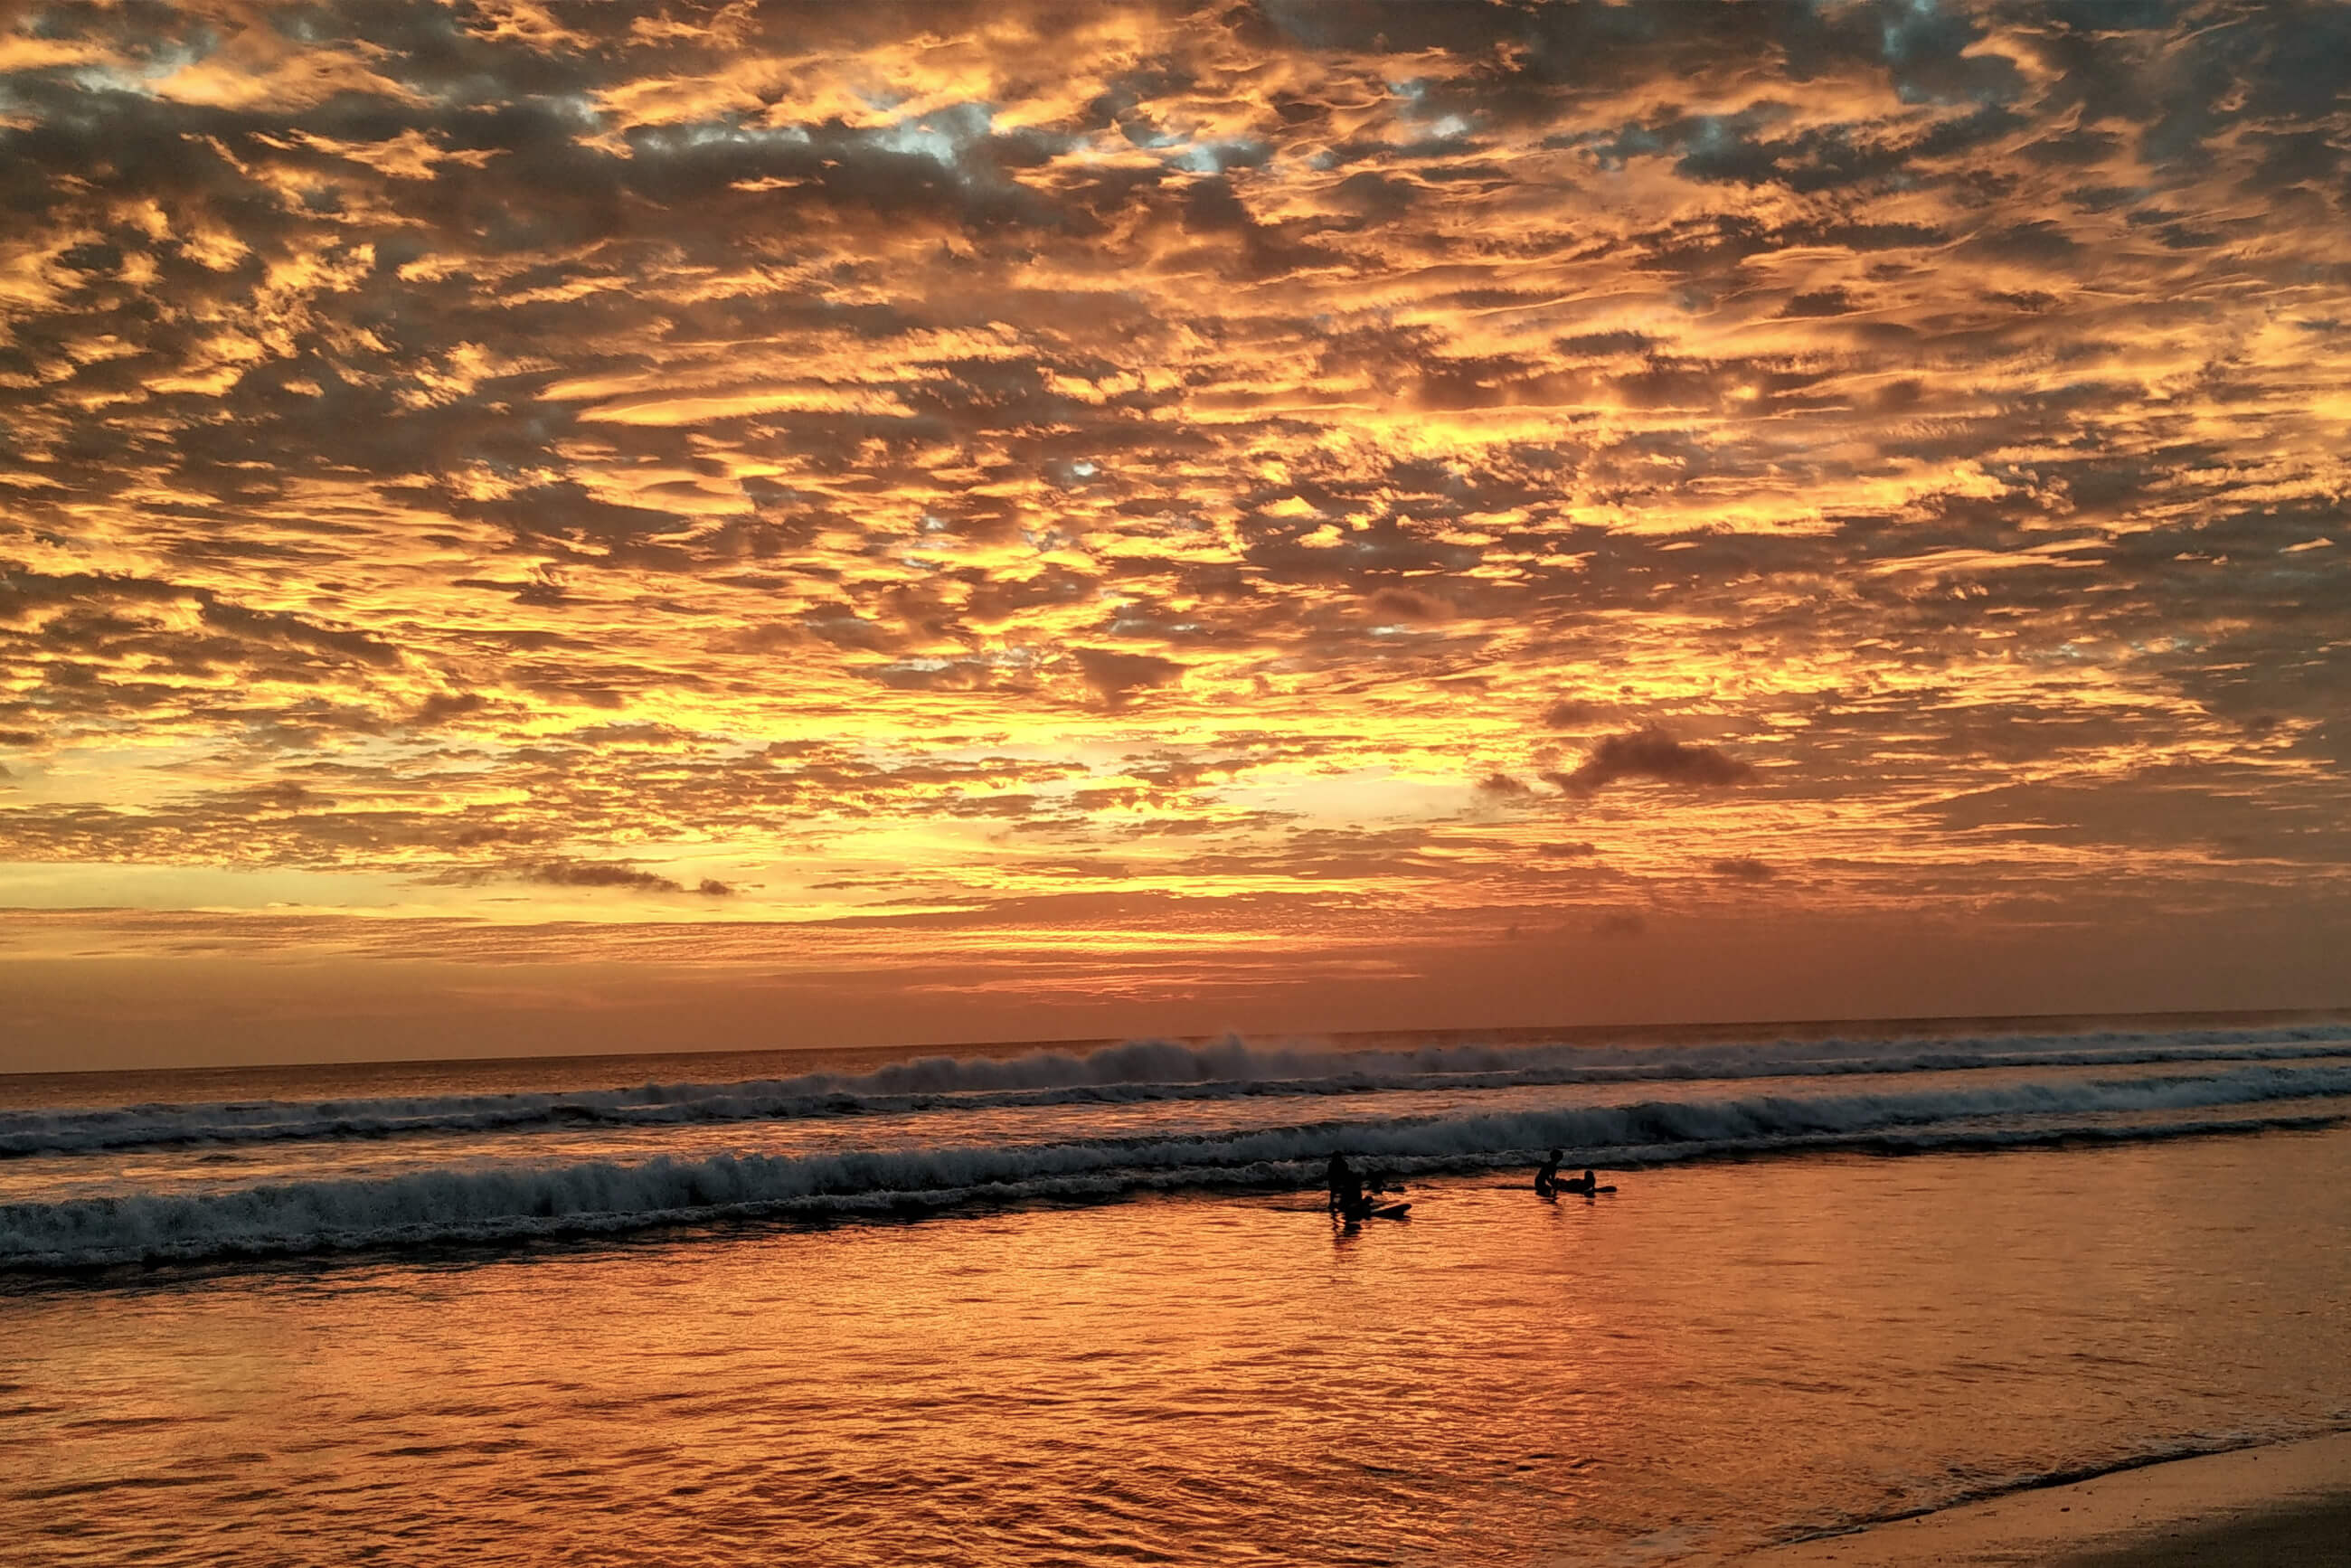 https://bubo.sk/uploads/galleries/7304/pixabay_indonezia_bali-2681979-1-.jpg